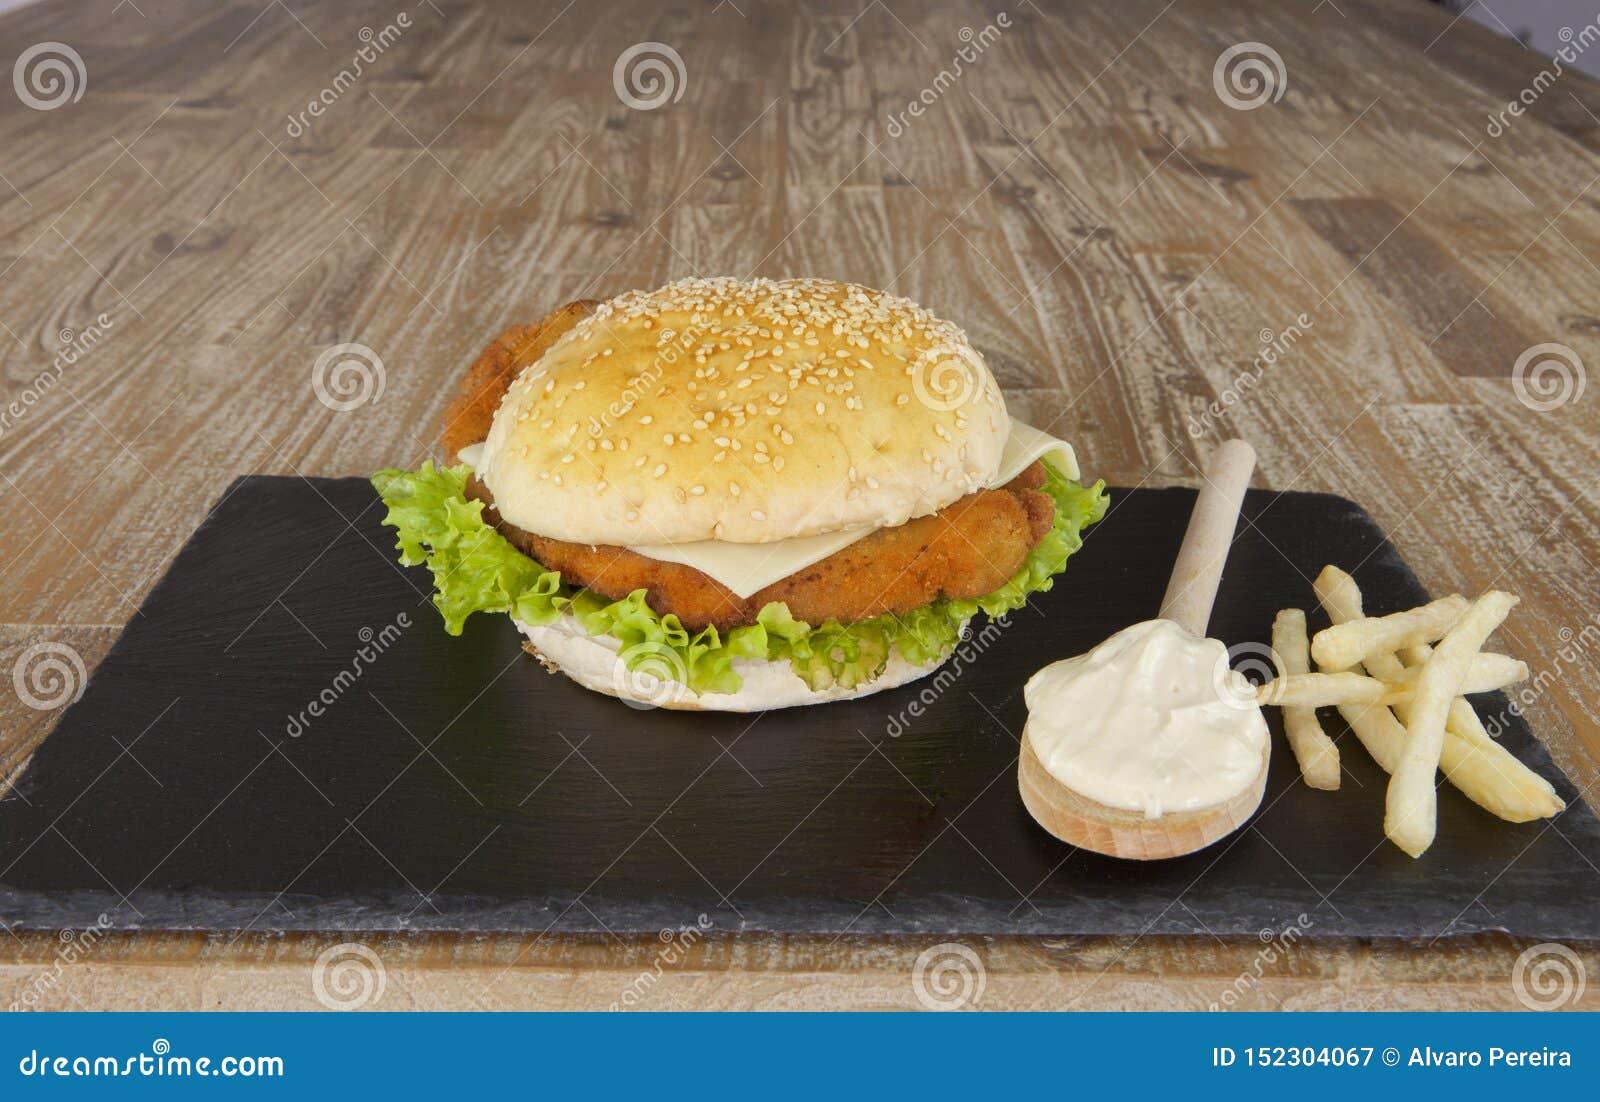 Hamburger del pollo